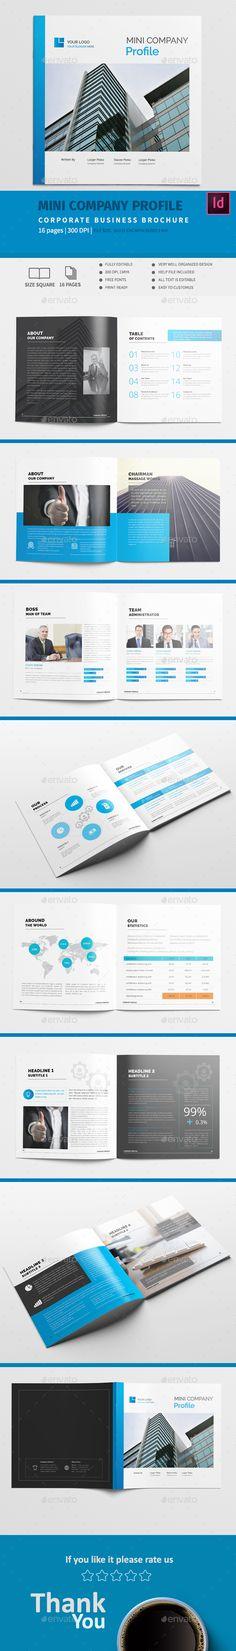 Company Profile Brochure Pinterest Company profile, Brochures